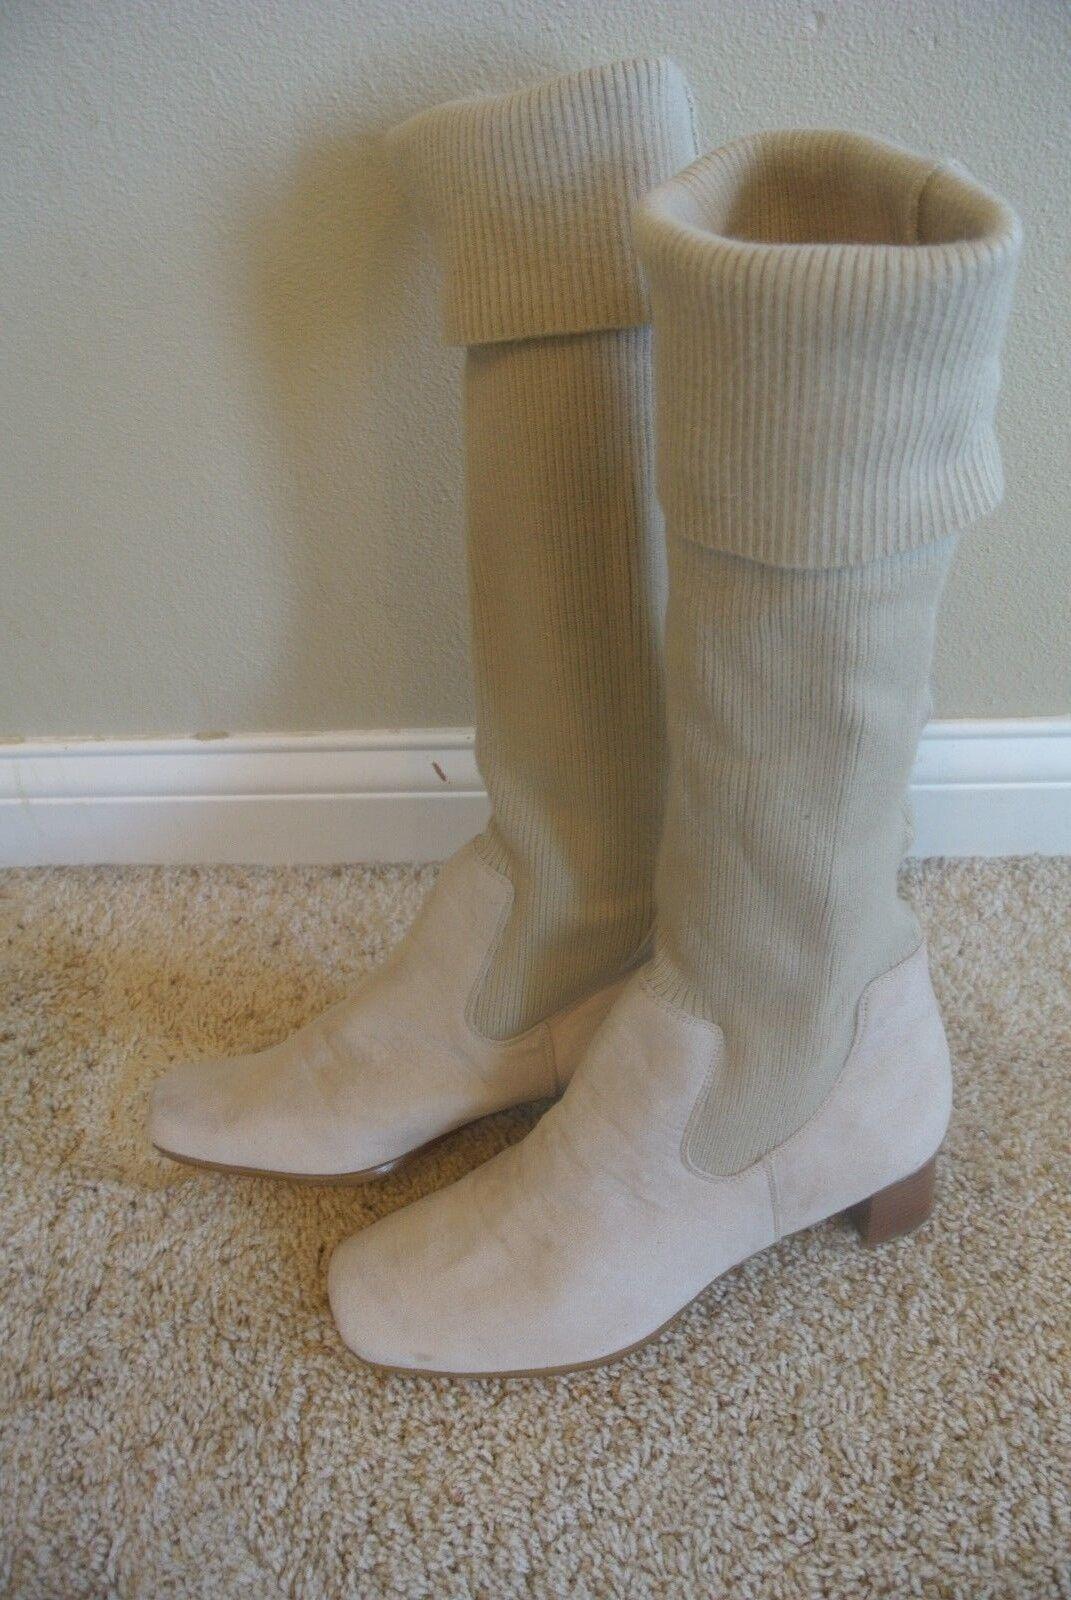 Markon Isabella Tan Faux Suede Sweater Knit Shaft Cuff Schuhe Stiefel Schuhe Cuff Größe 11 W Wide 172eff